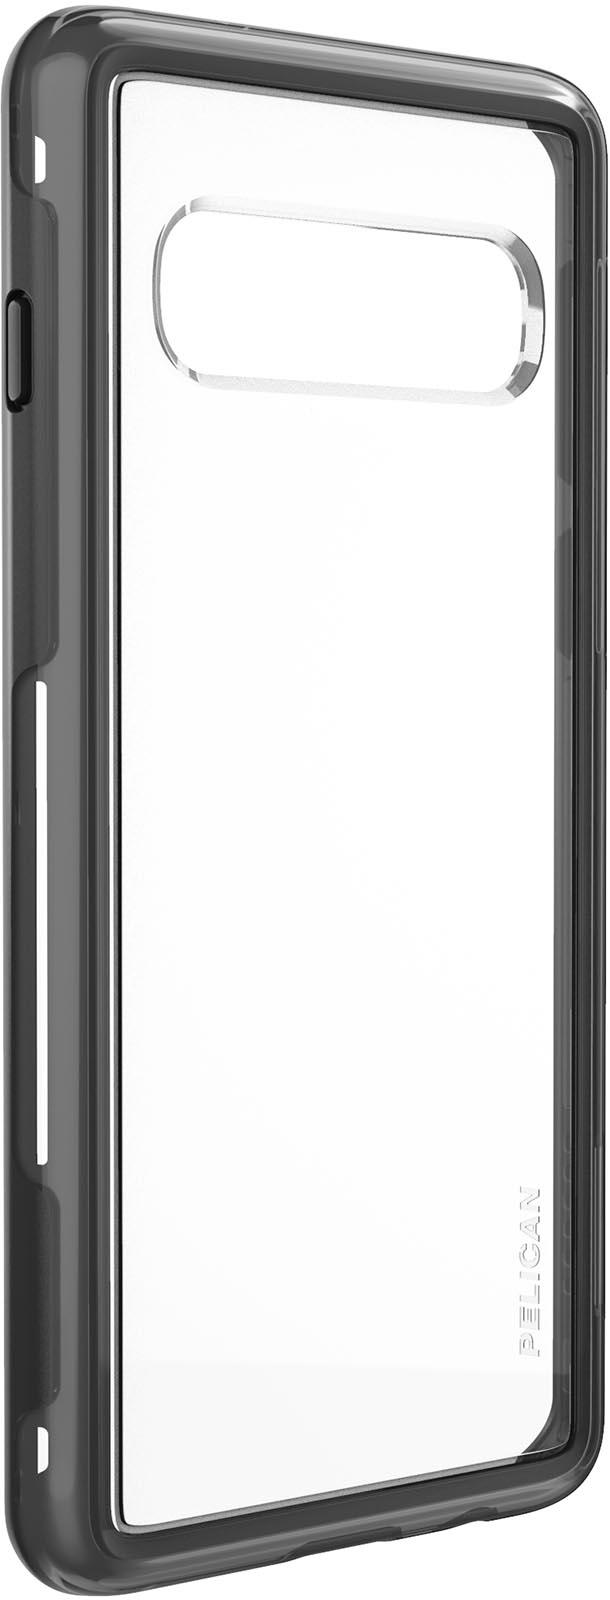 pelican samsung galaxy s10 adventurer phone case